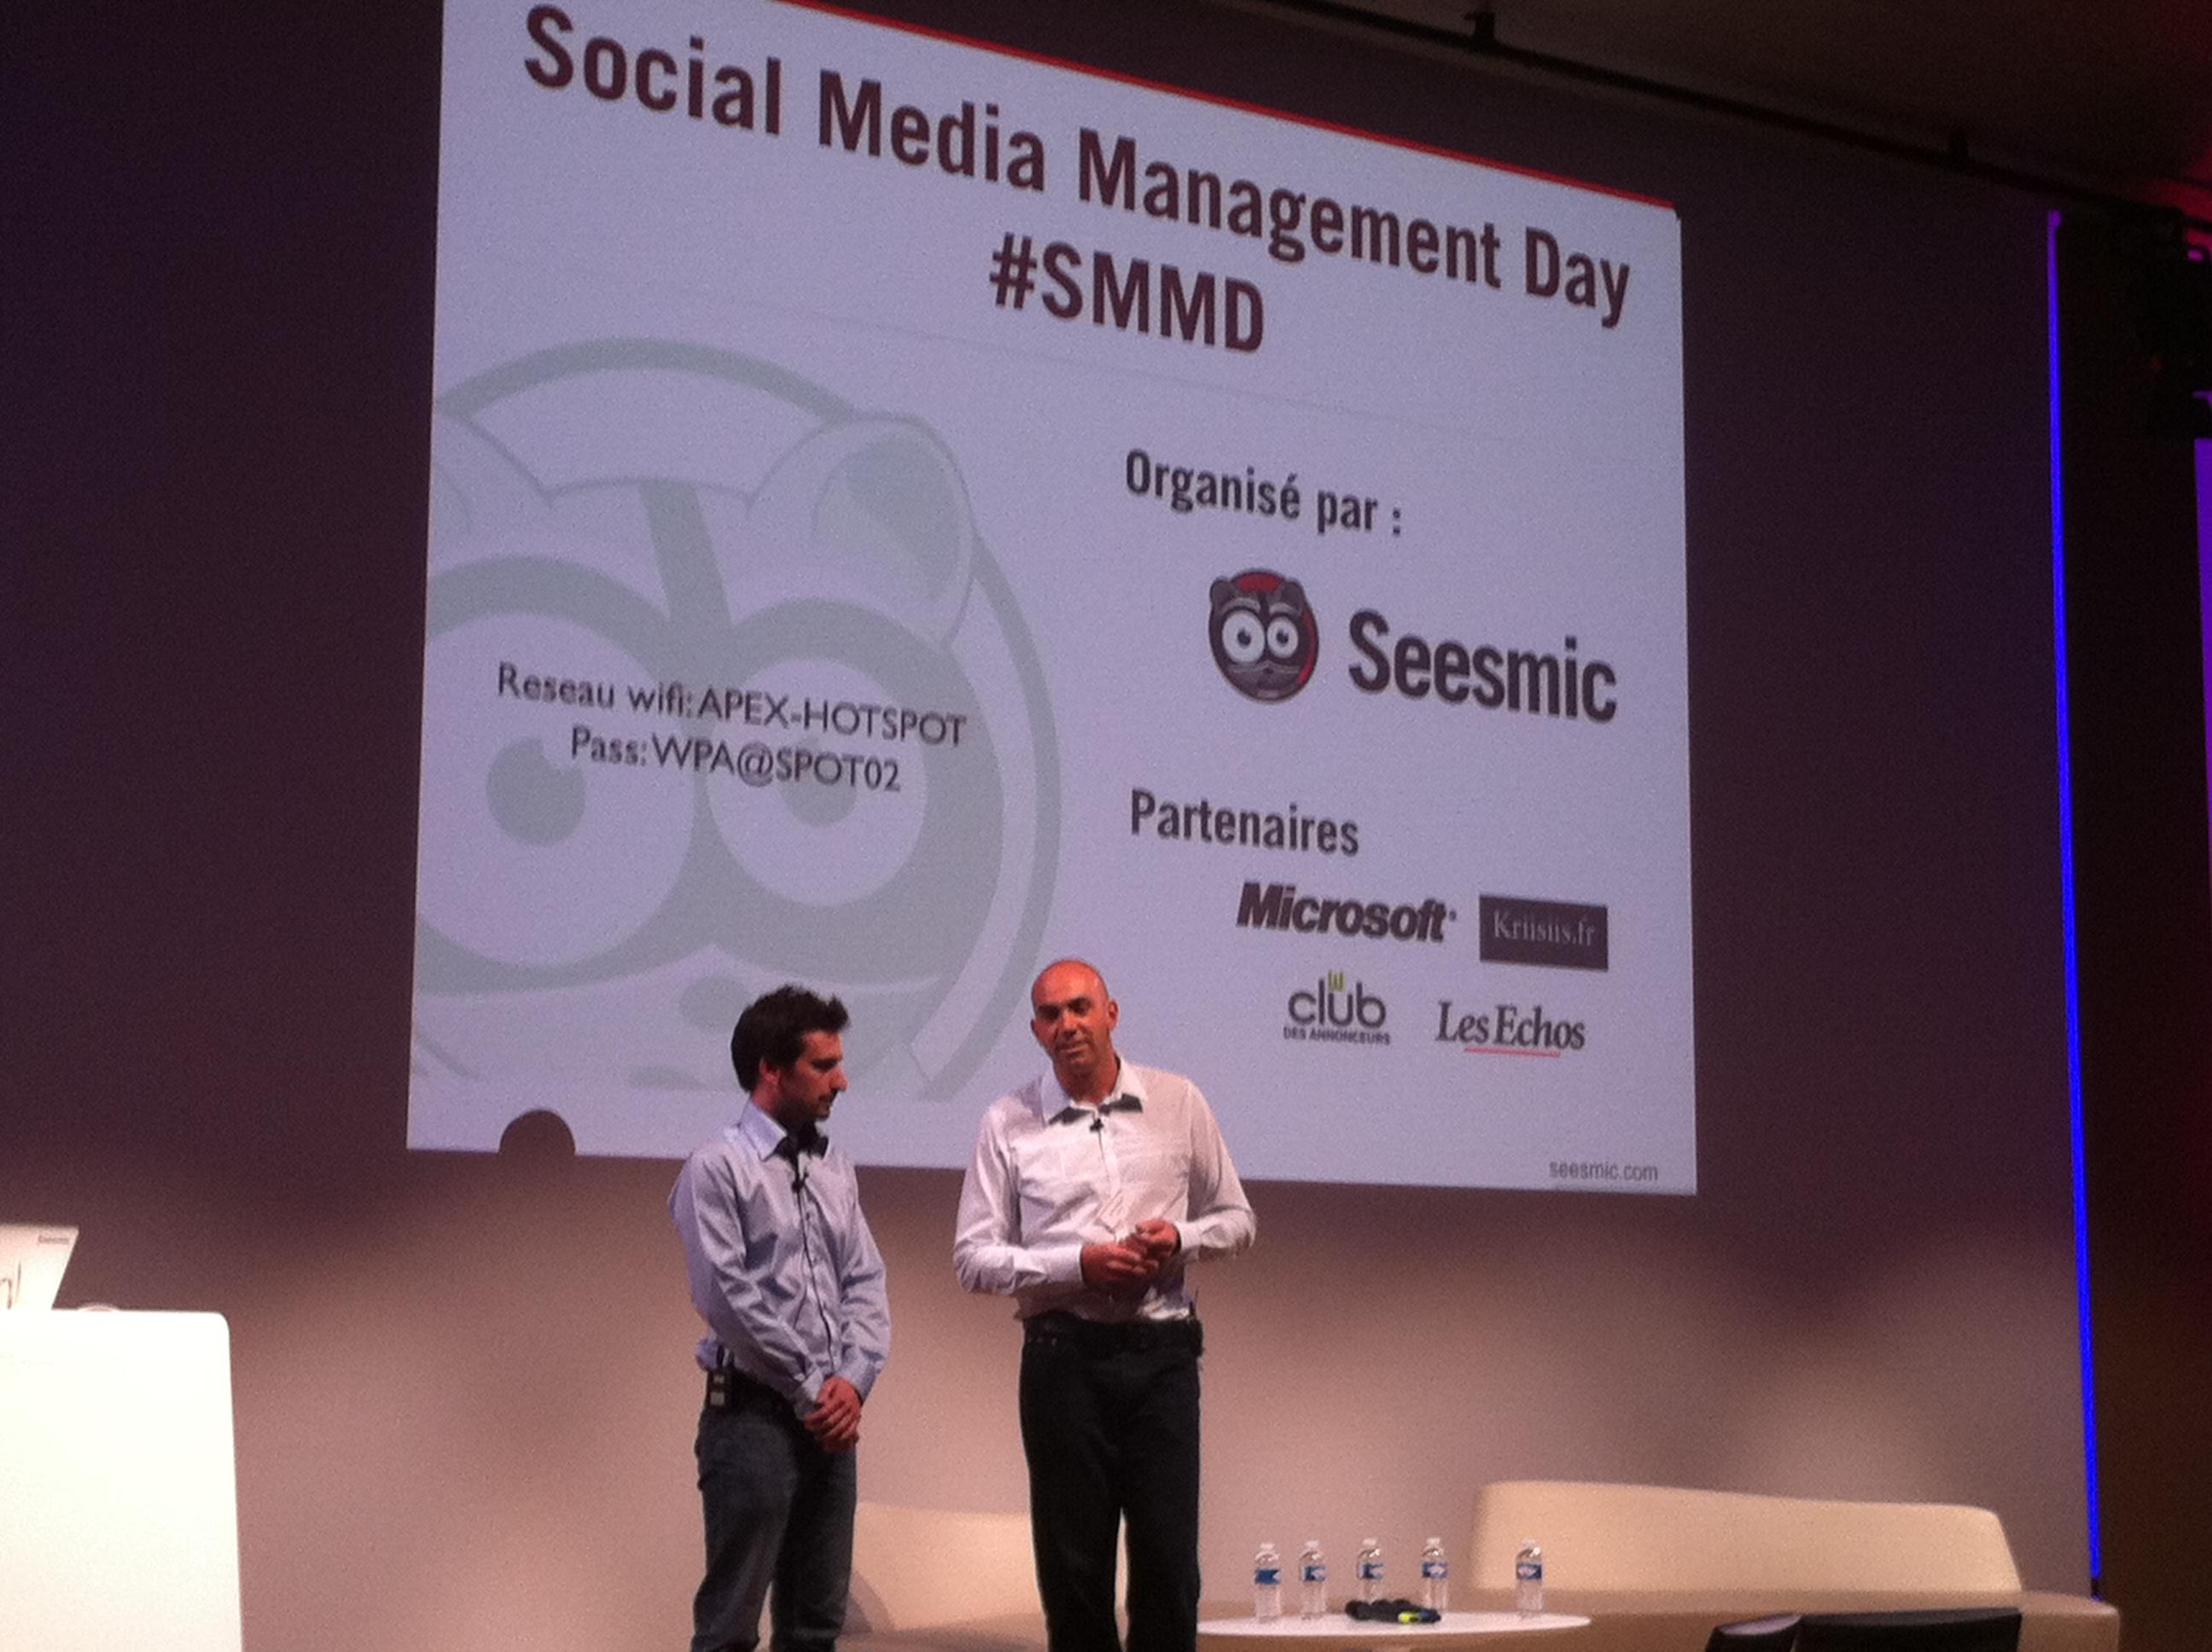 Social Media Management Day